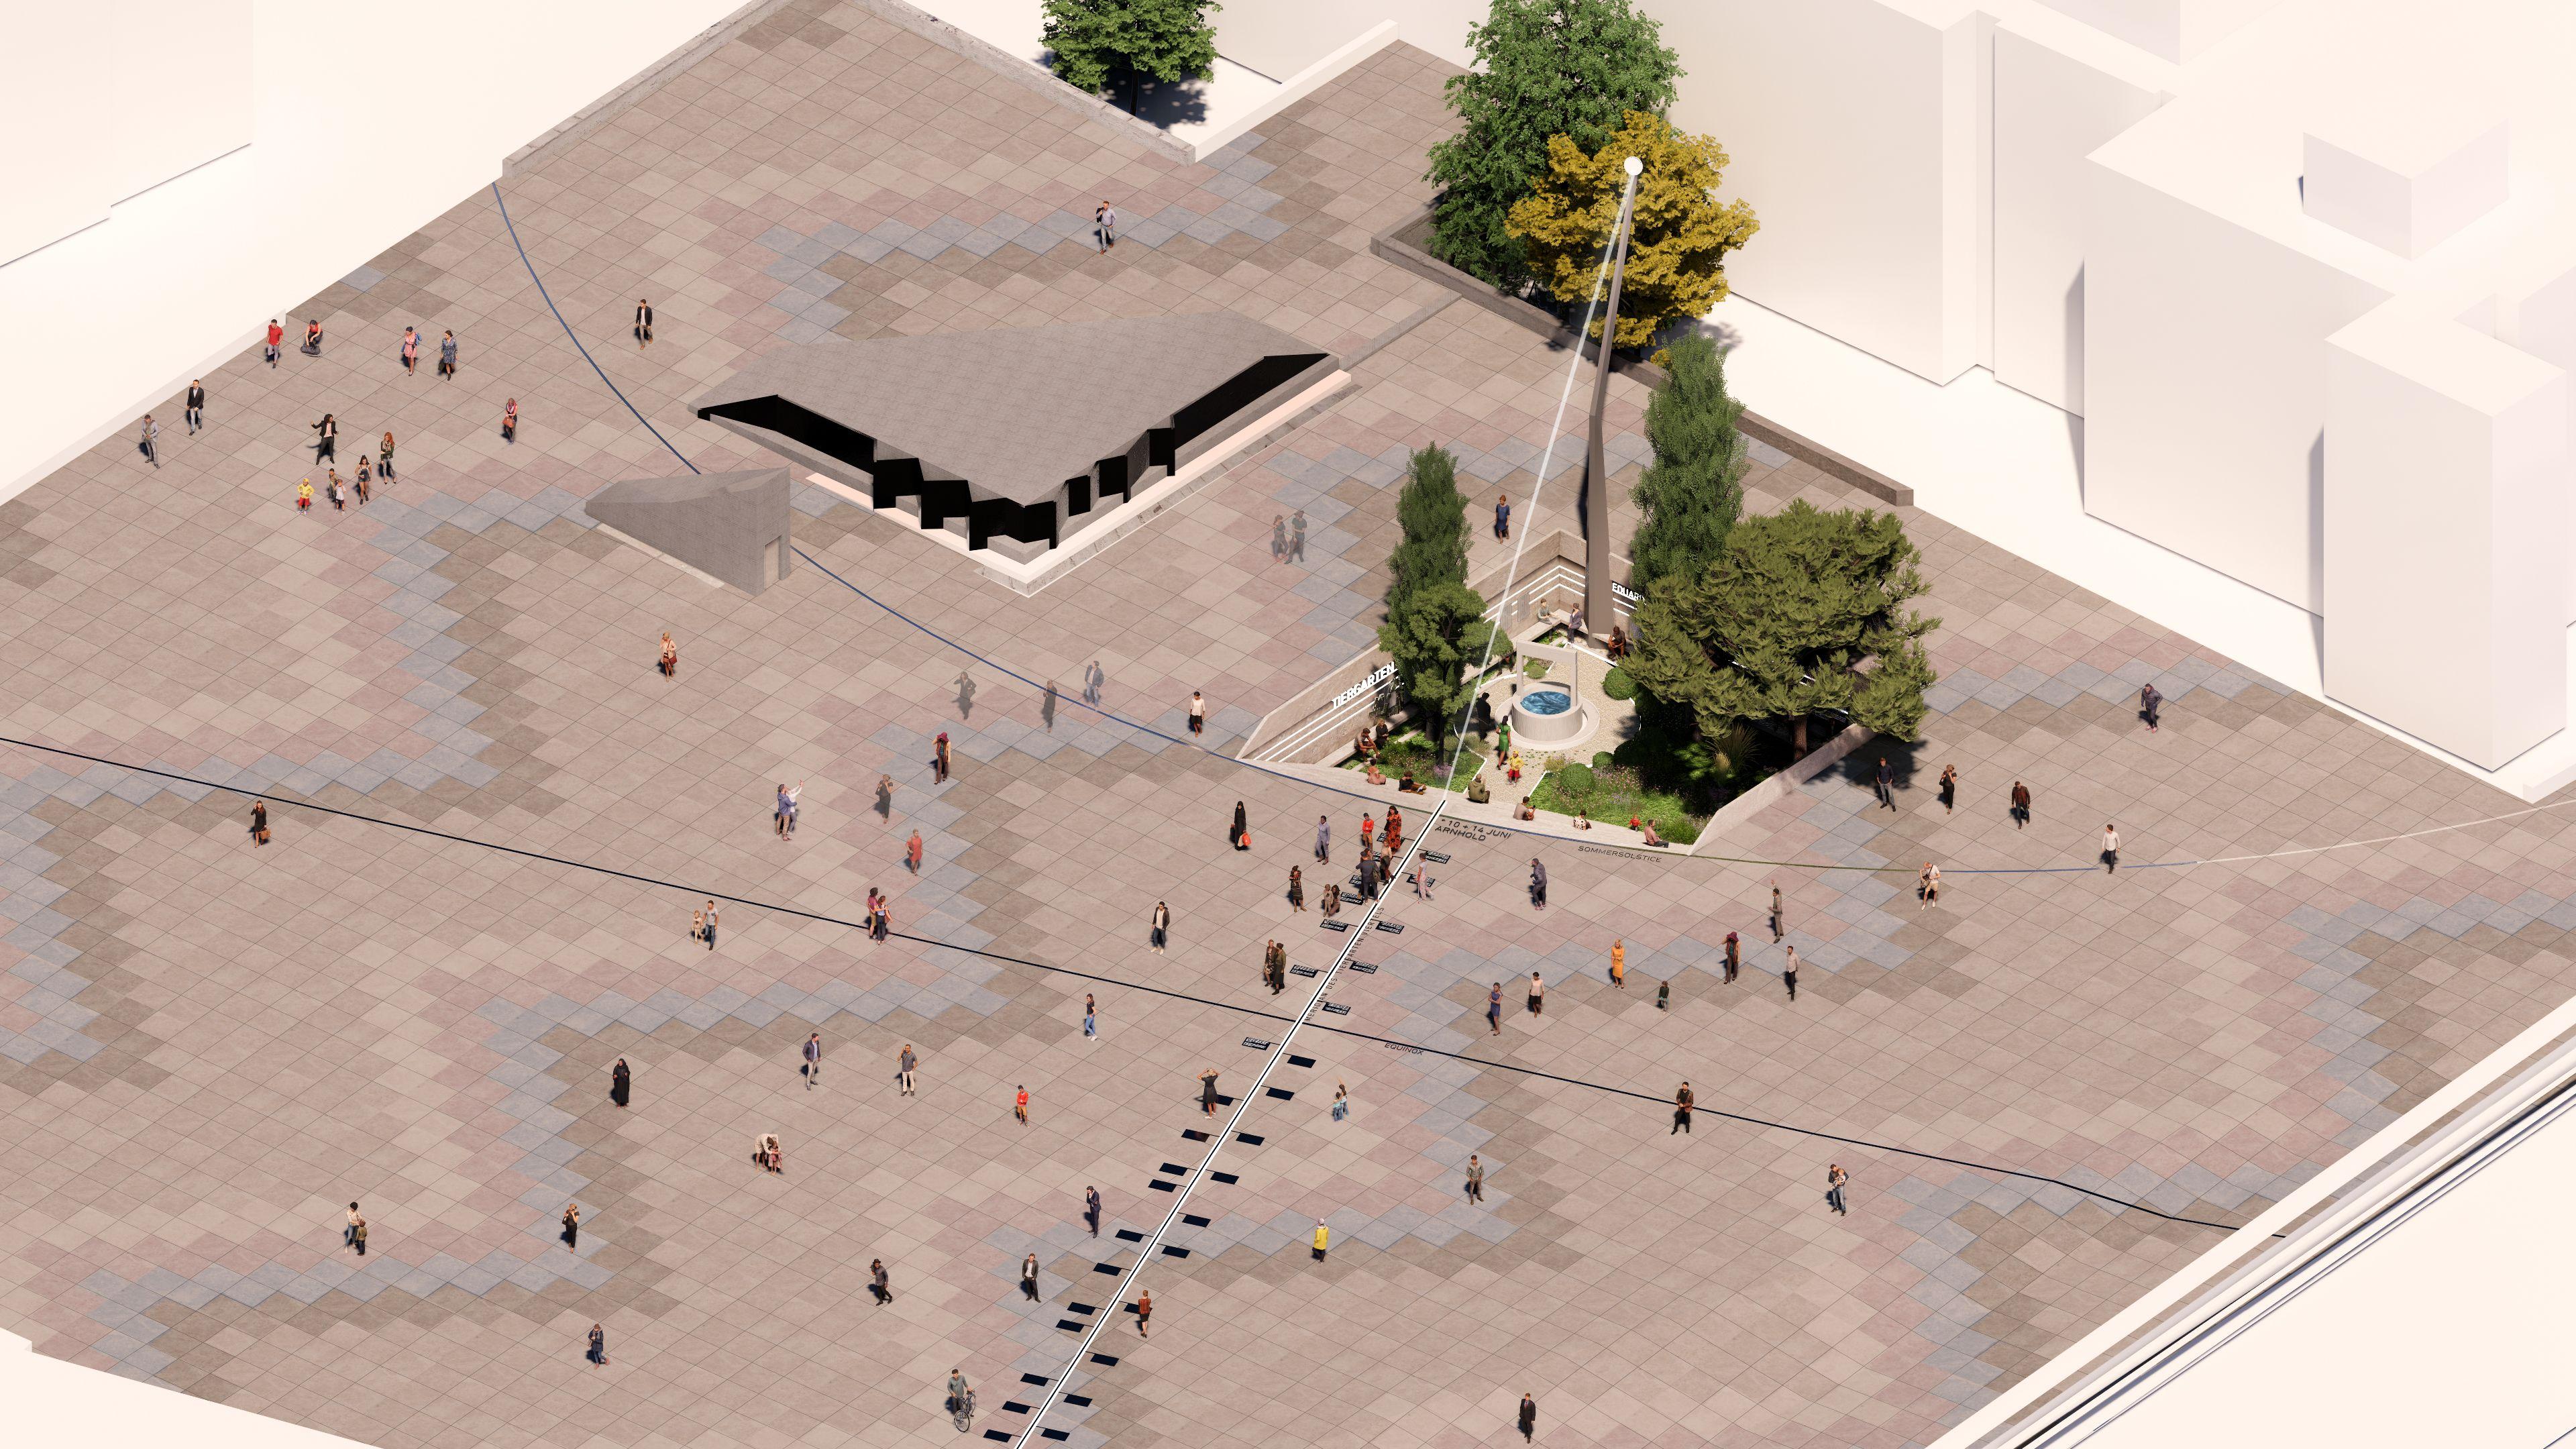 Proposed design by Lars Krückeberg with GRAFT: Fragments of Villa Massimo's Garden with Arnhold-Meridian – Johanna und Eduard Arnhold Square © 2021 Lars Krückeberg with GRAFT Architects